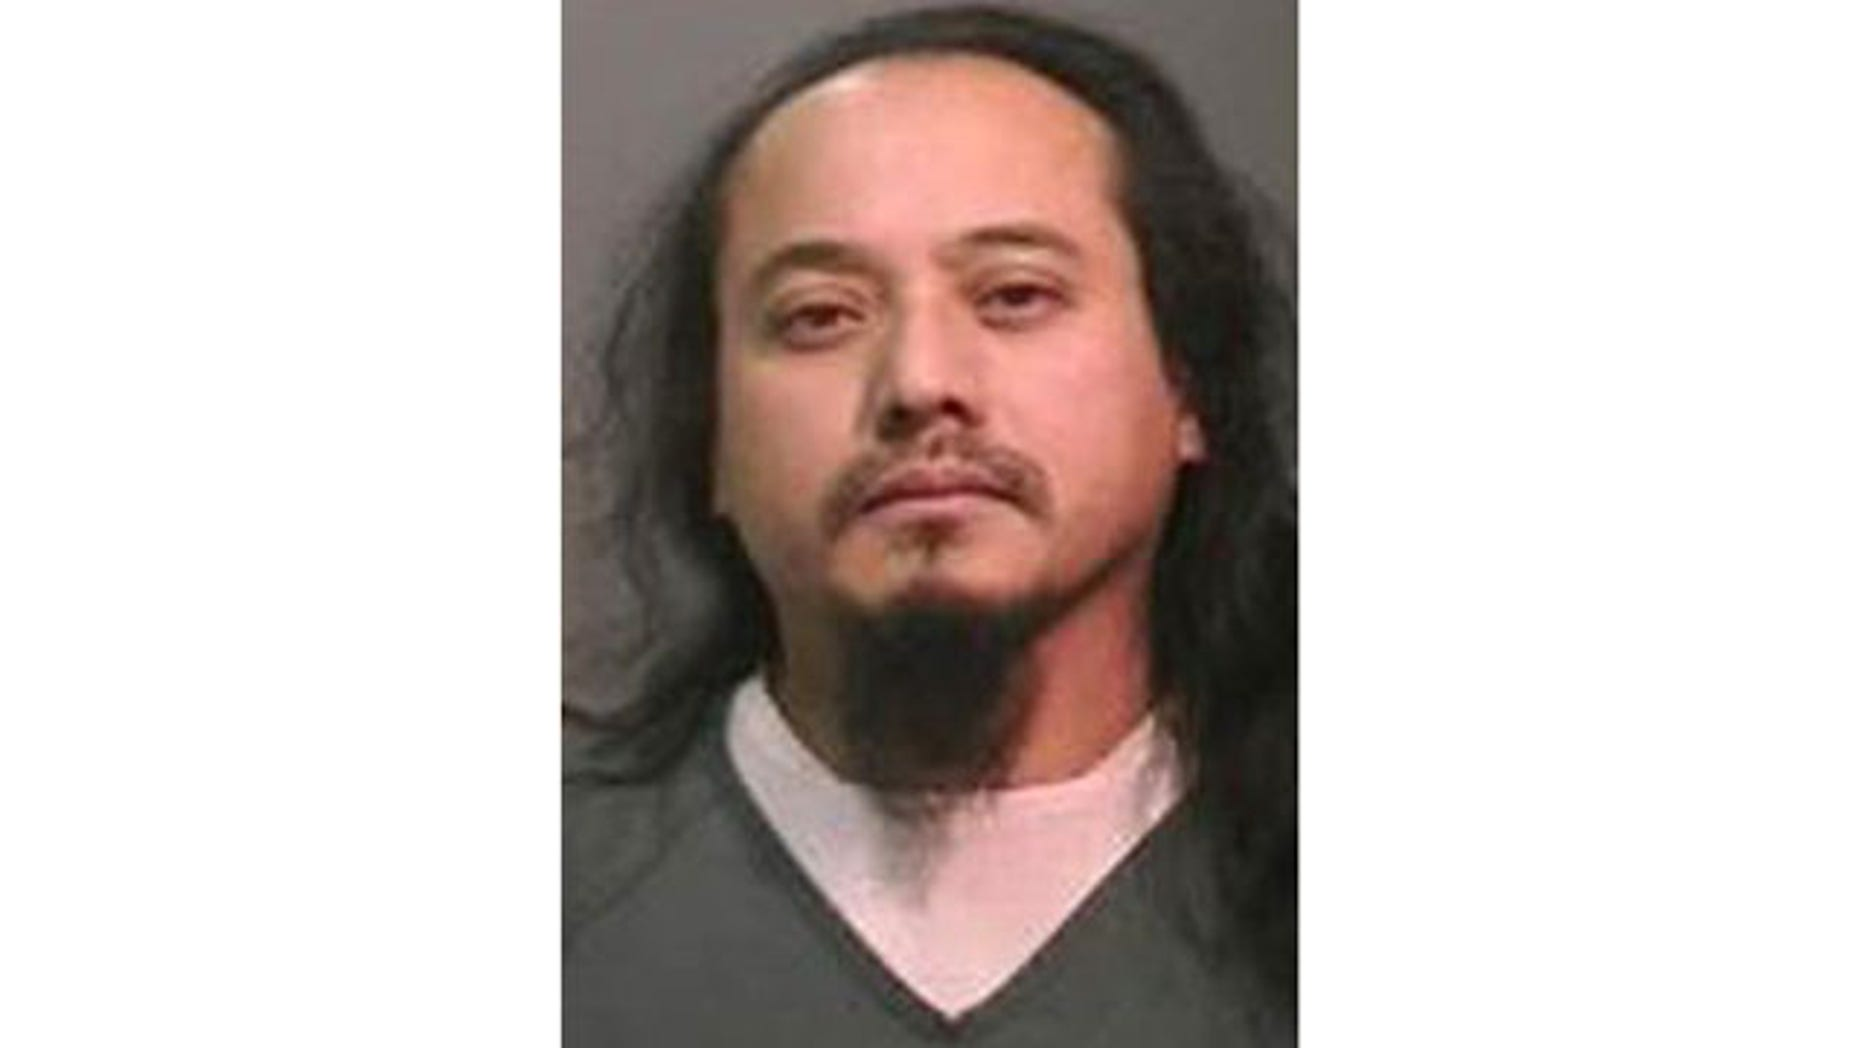 Photo provided by the Jackson County Jail shows Jordan Adam Criado in 2005.